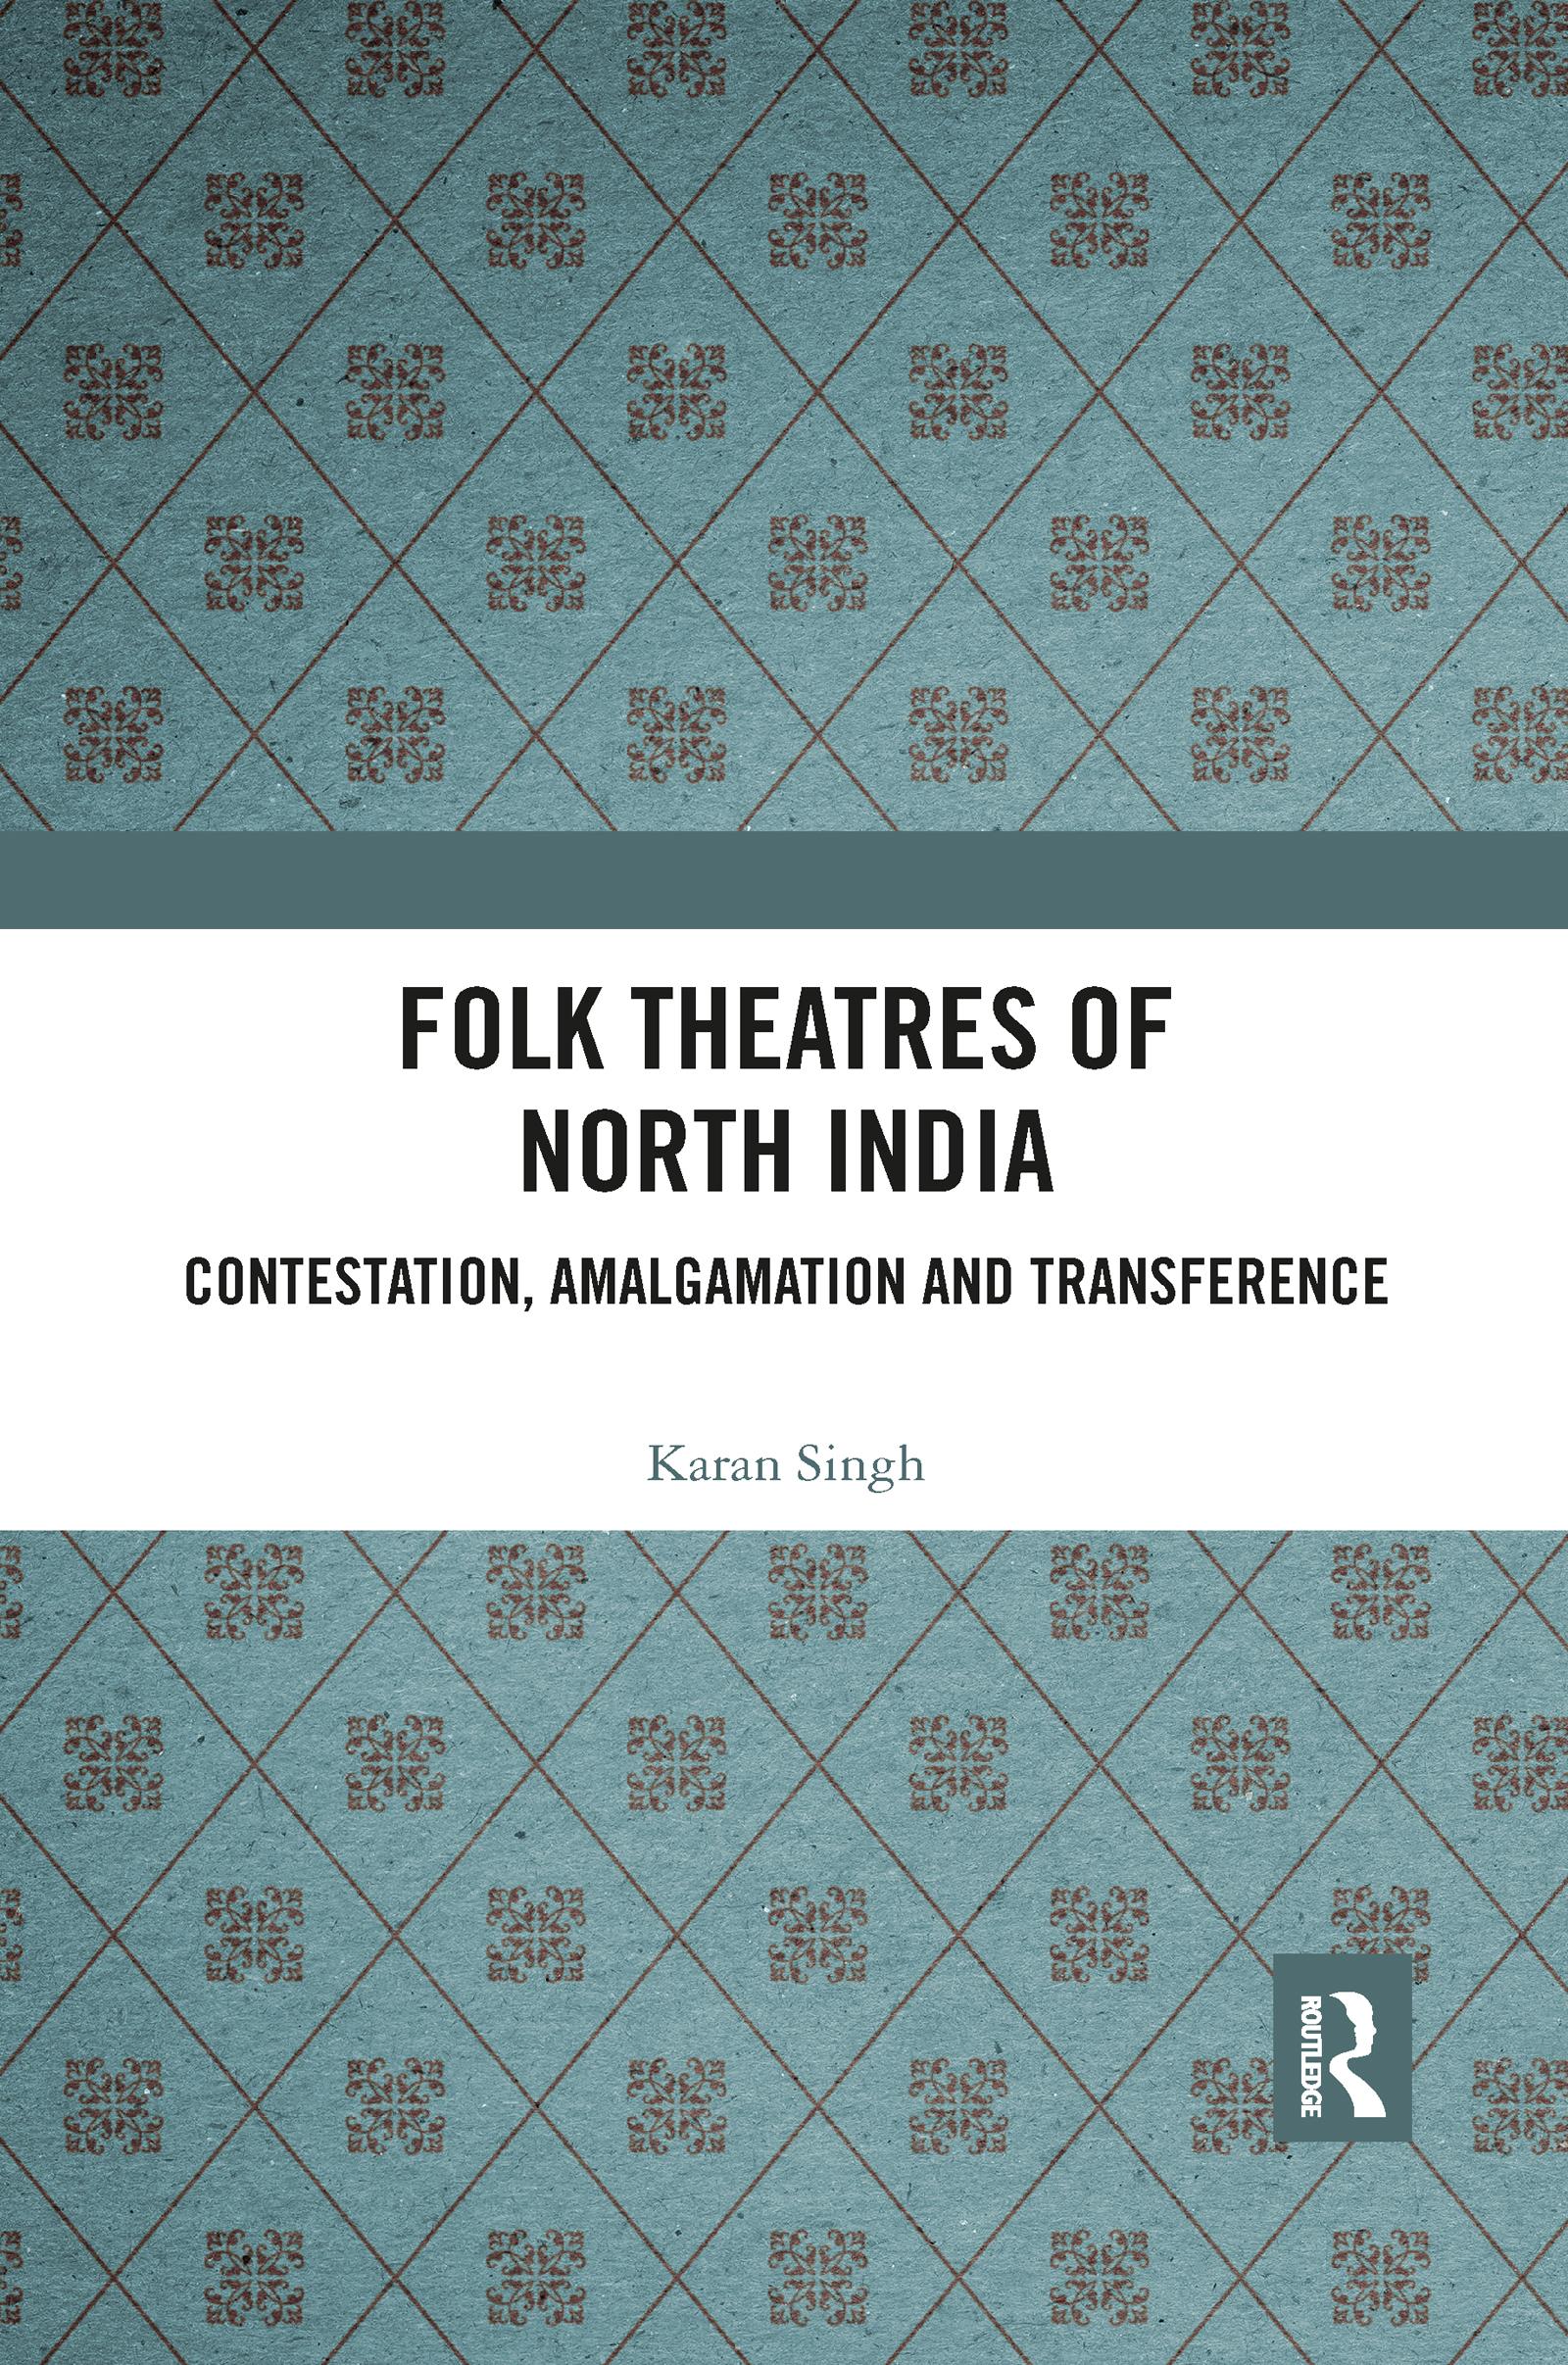 Folk Theatres of North India